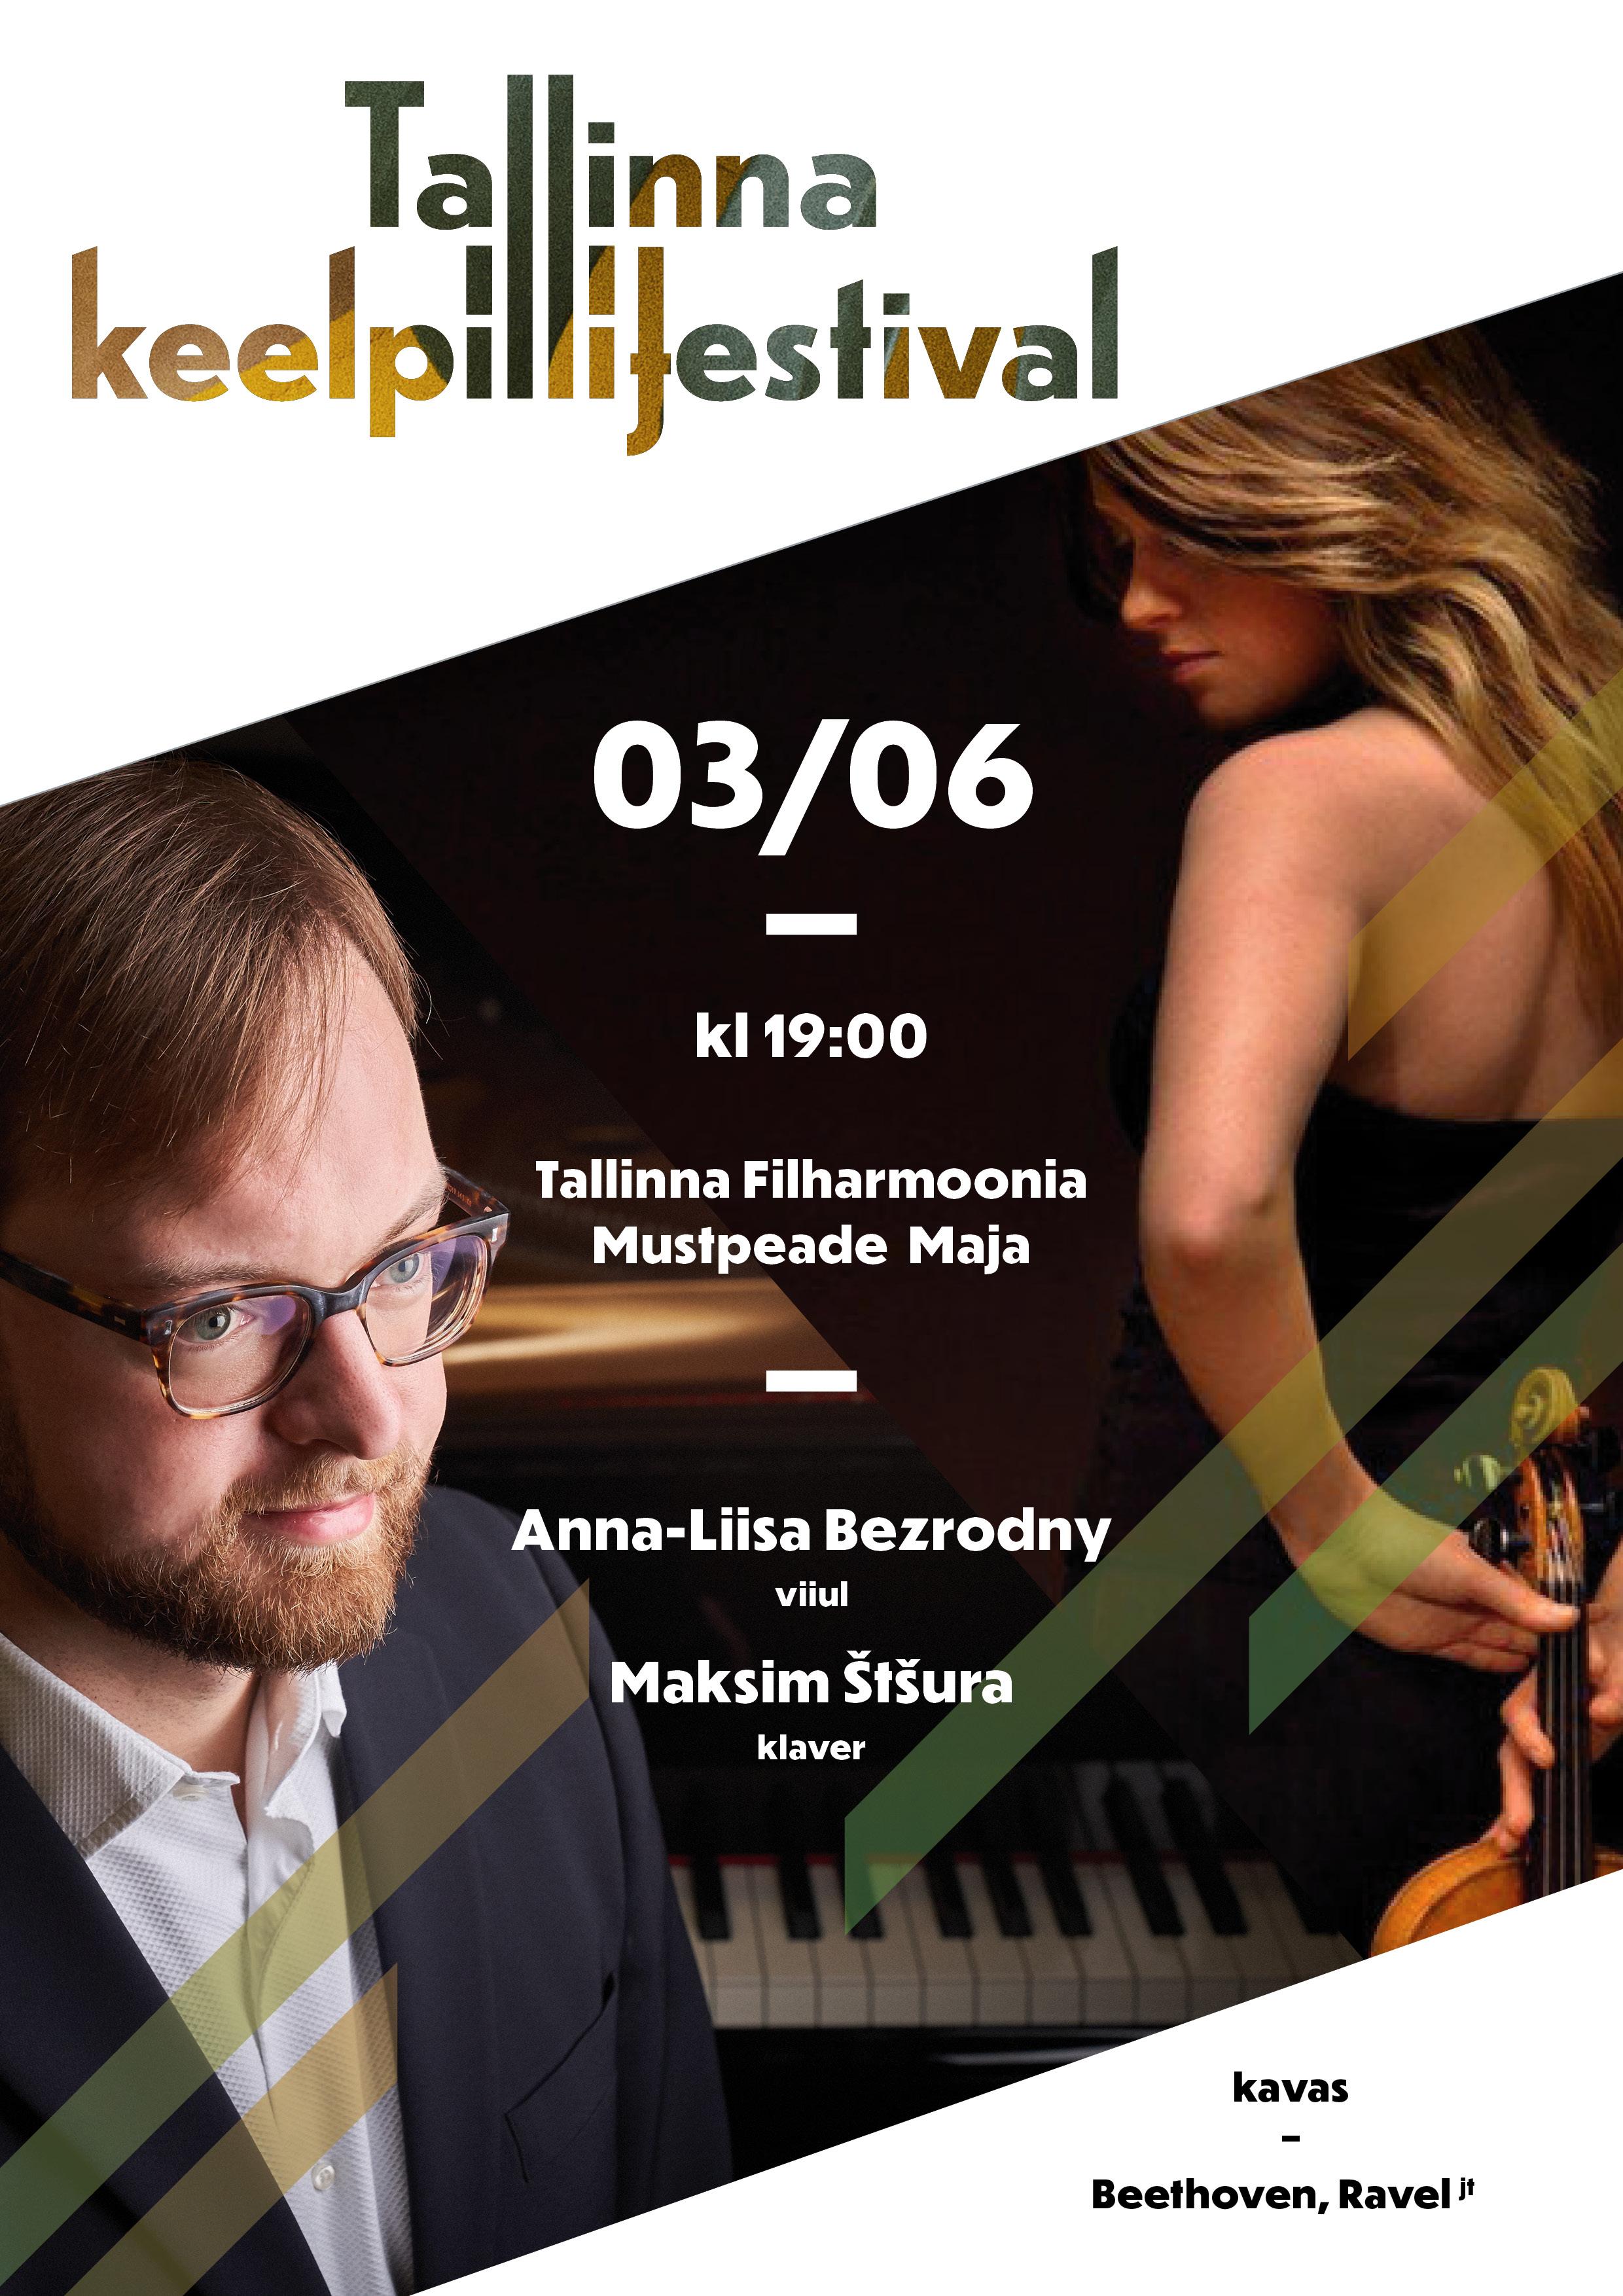 Anna-Liisa Bezrodny (viiul), Maksim Štšura (klaver) / Tallinna Keelpillifestival